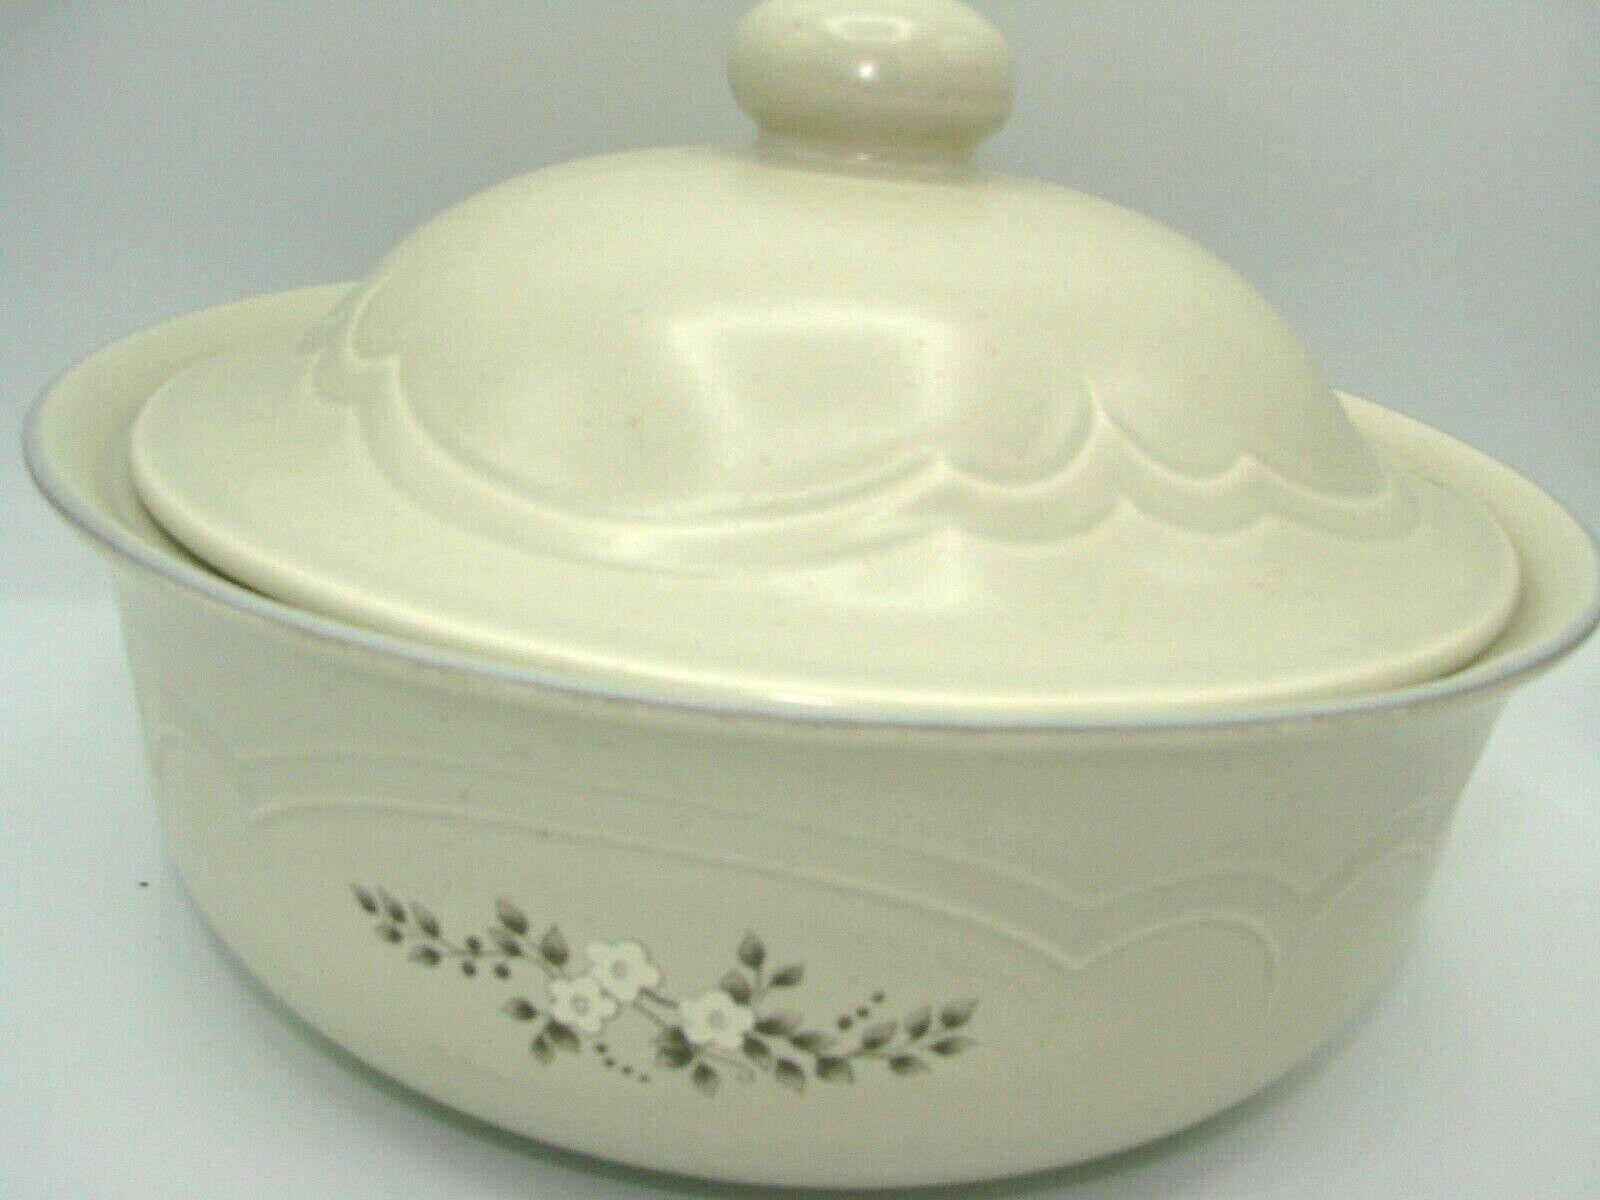 Pristine Pfaltzgraff Heirloom Covered Casserole Dish 8.75 2 Quart White Flowers image 2